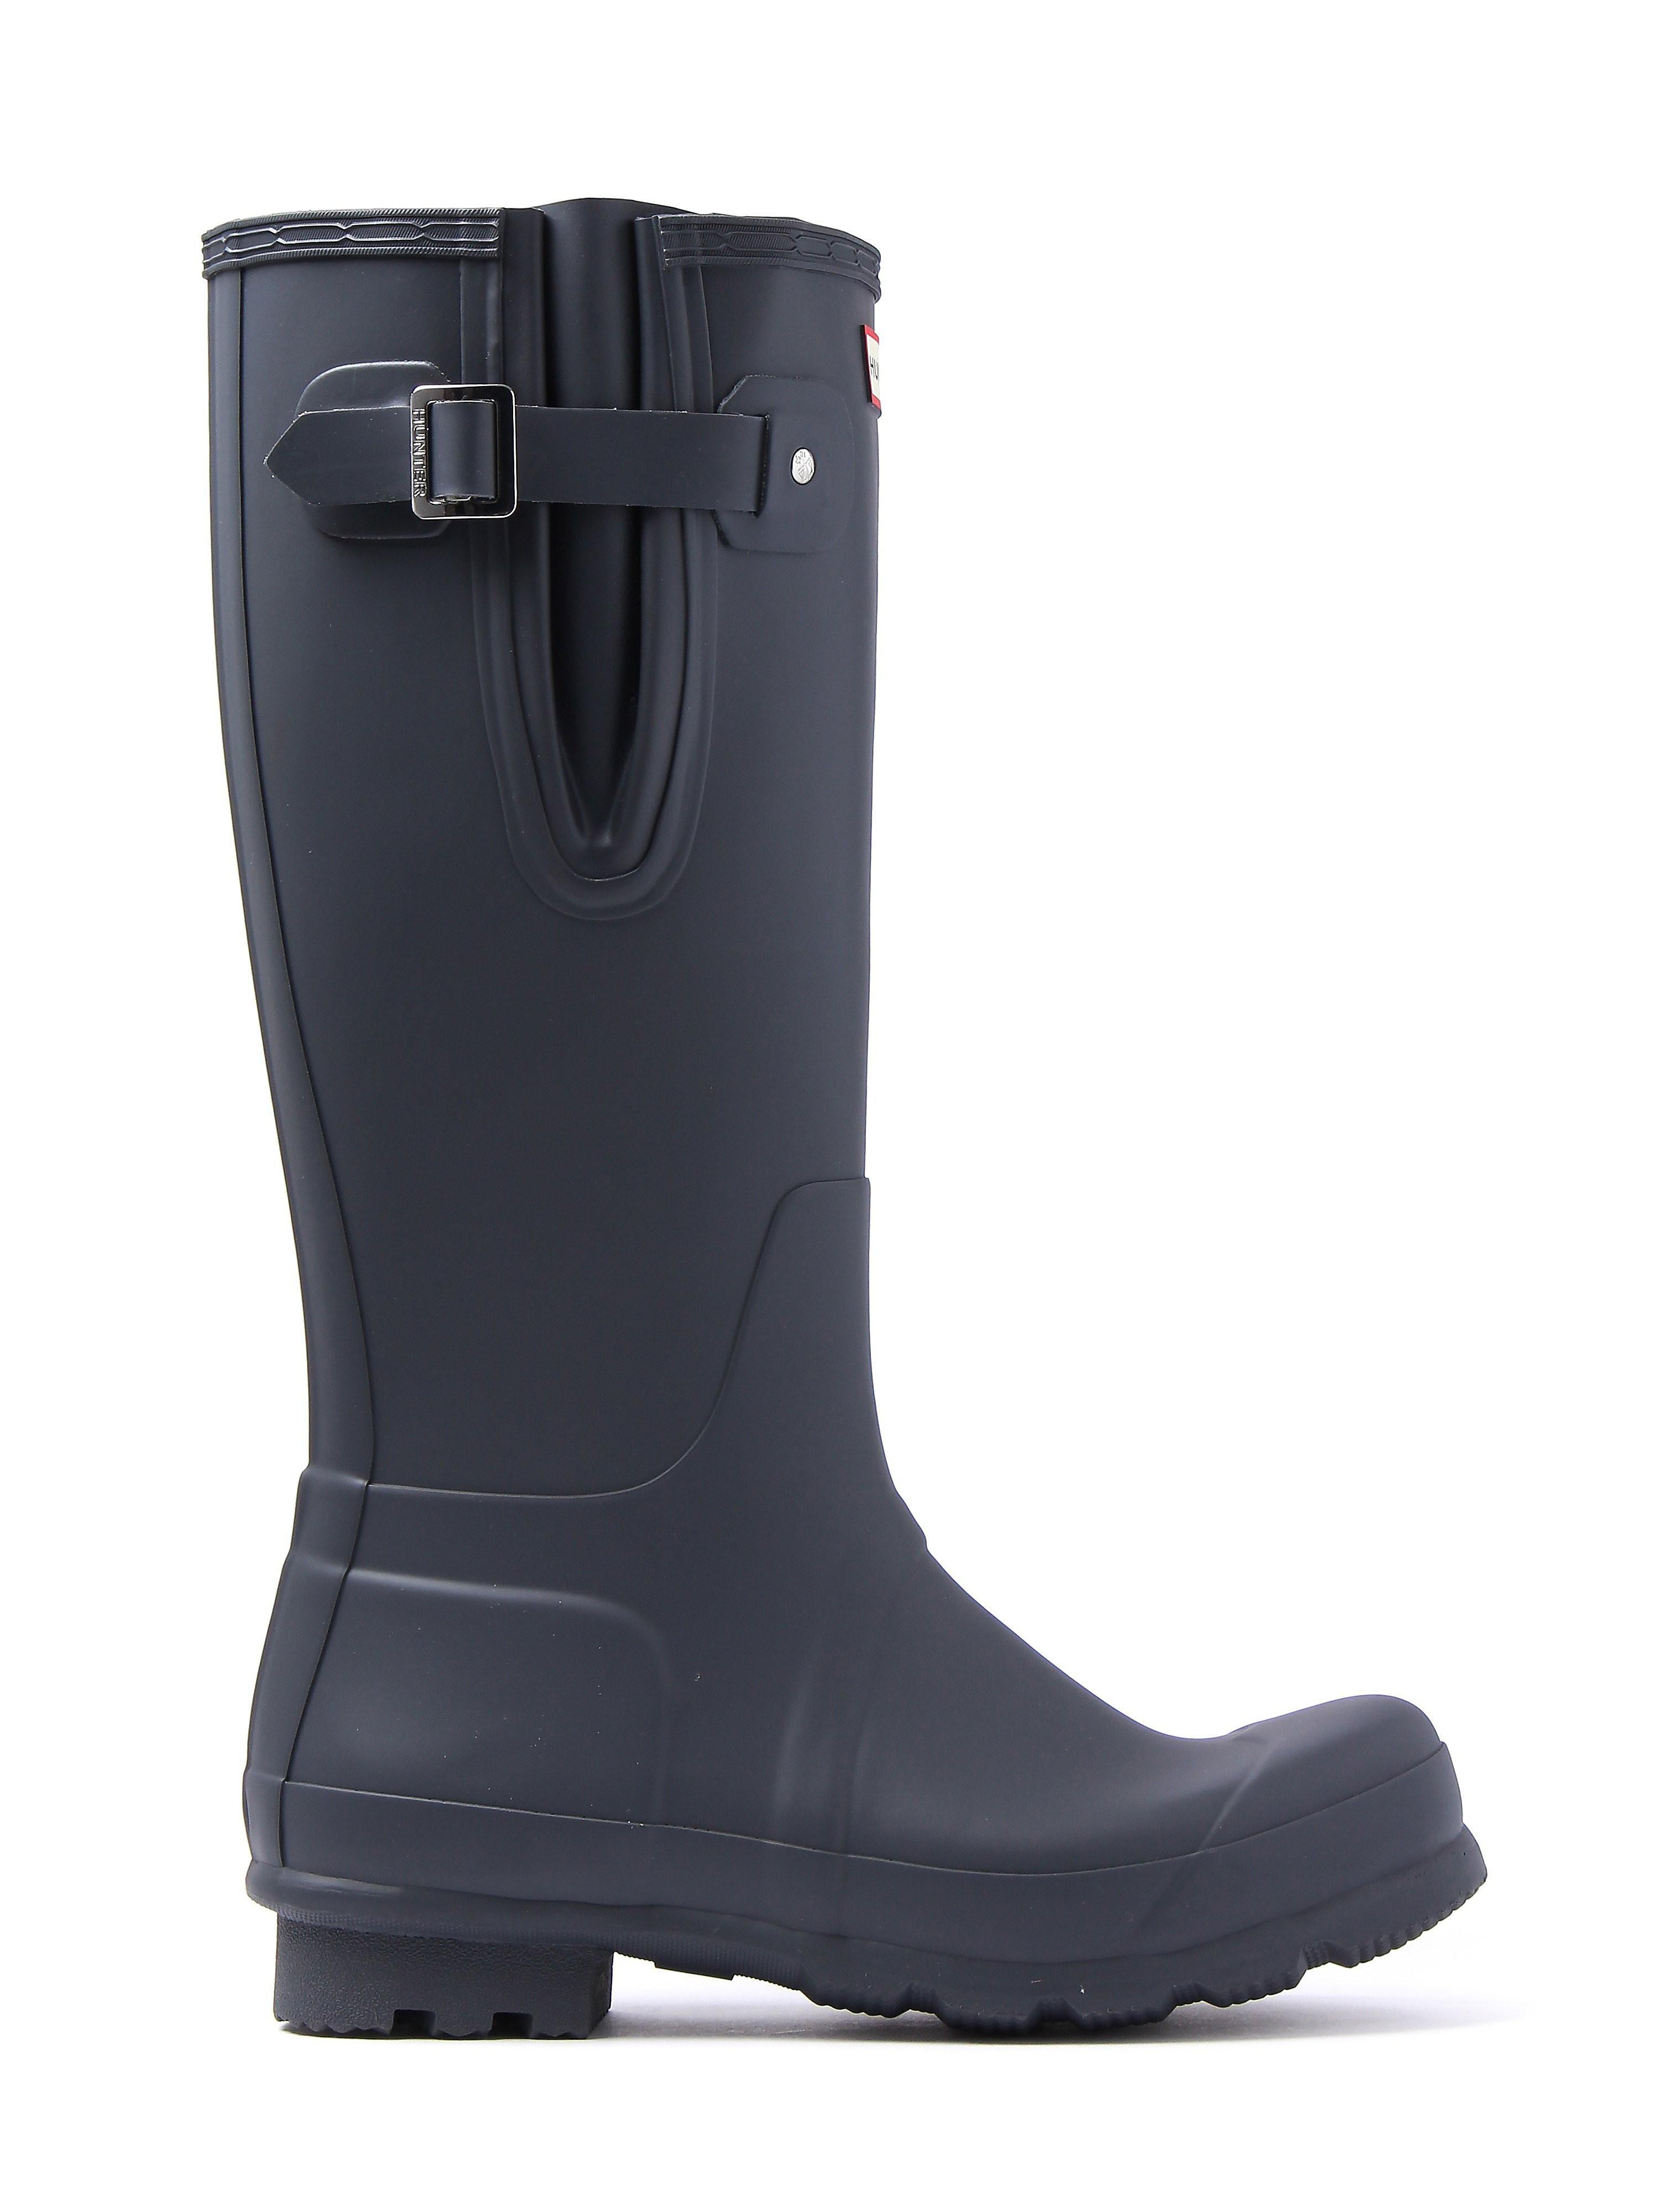 Hunter Wellies Men's Original Side Adjustable Wellington Boots - Dark Slate